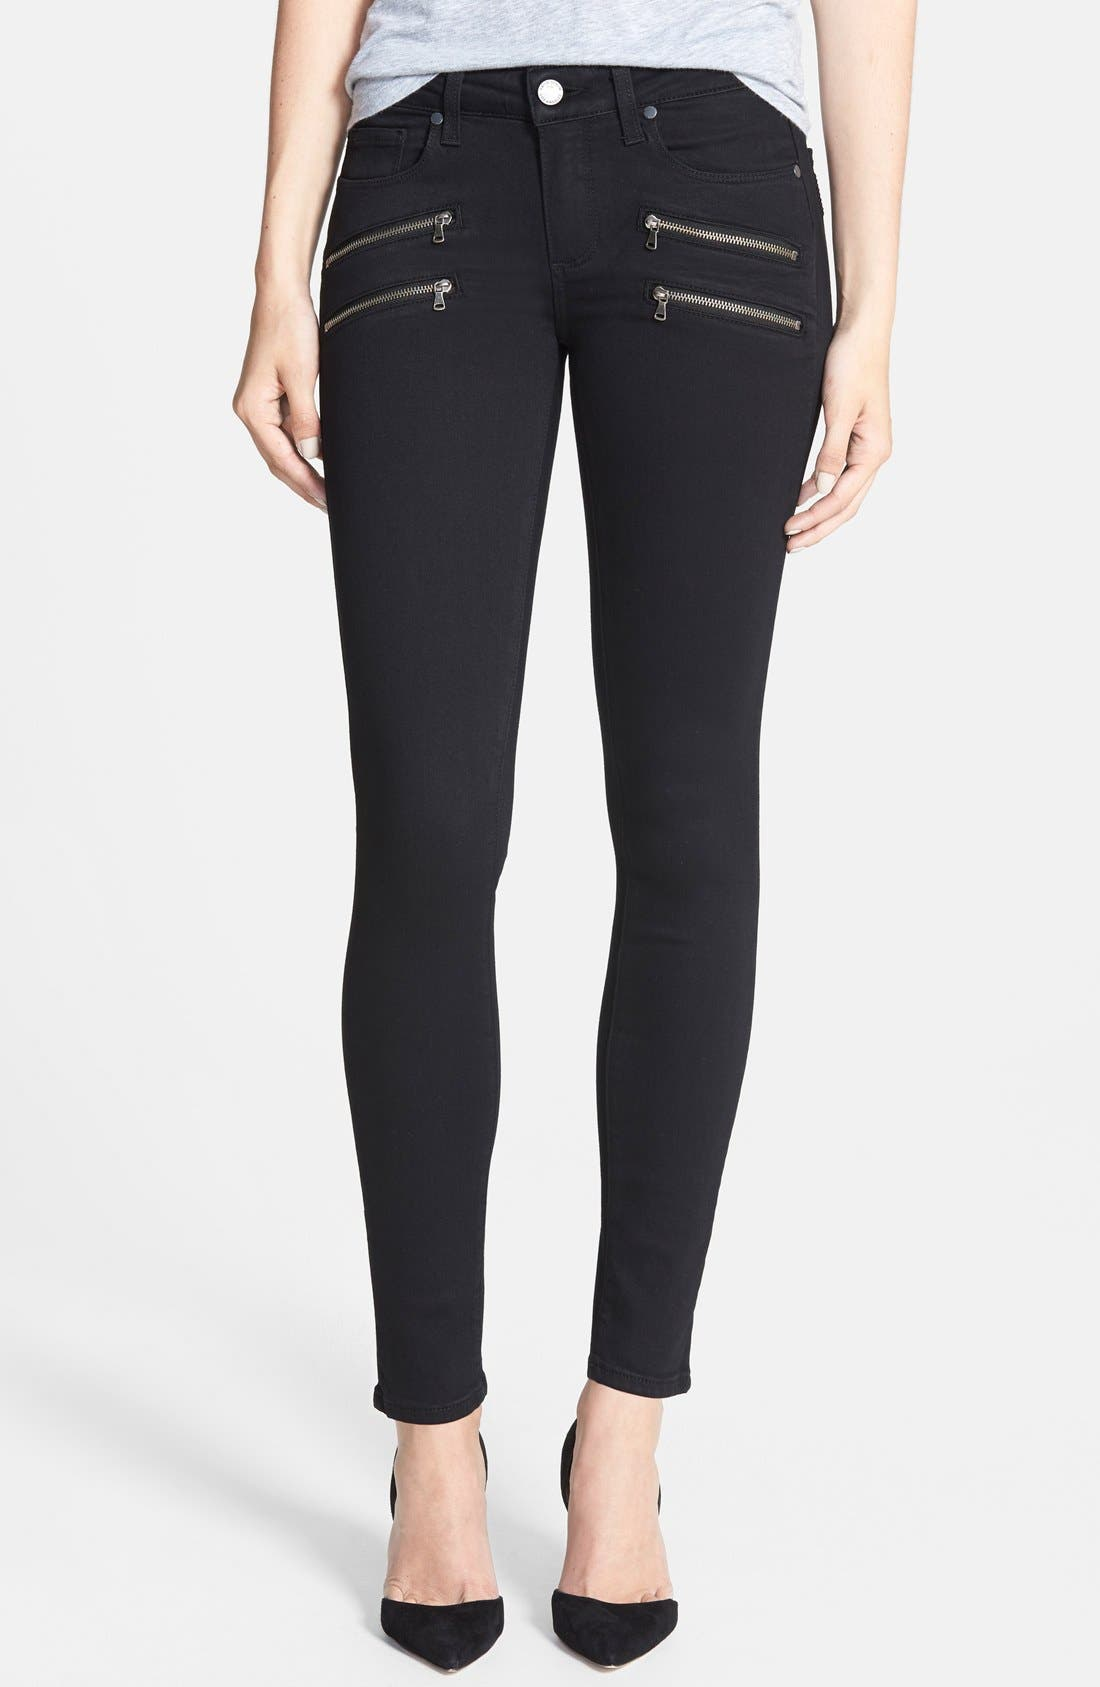 PAIGE 'Transcend - Edgemont' Ultra Skinny Jeans